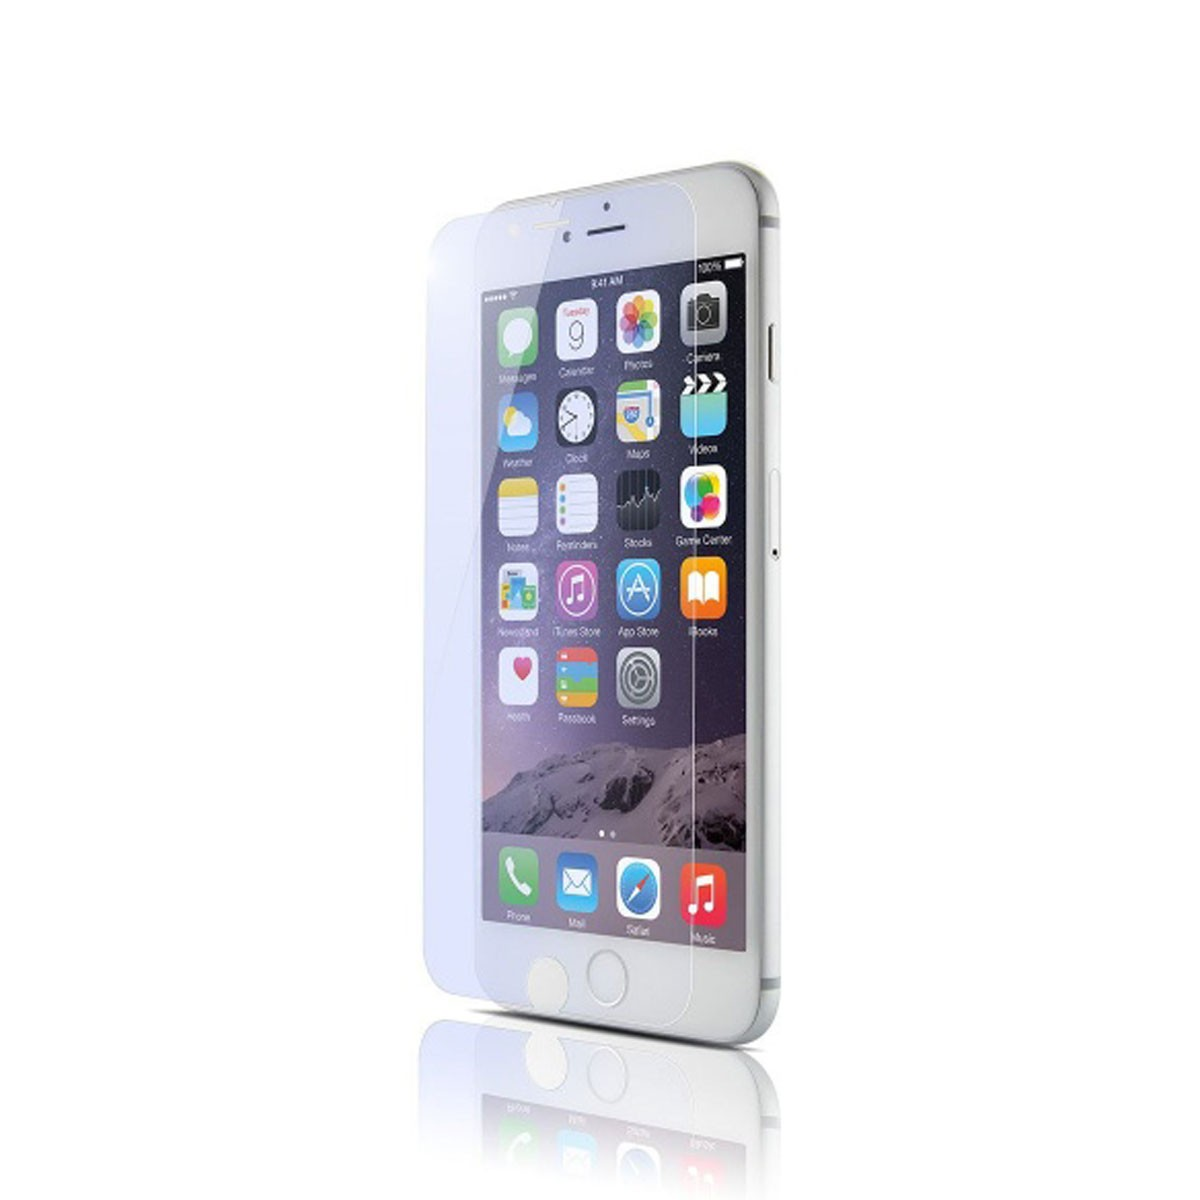 Син протектор QDOS OptiGuard Flexi Blue за iPhone 6